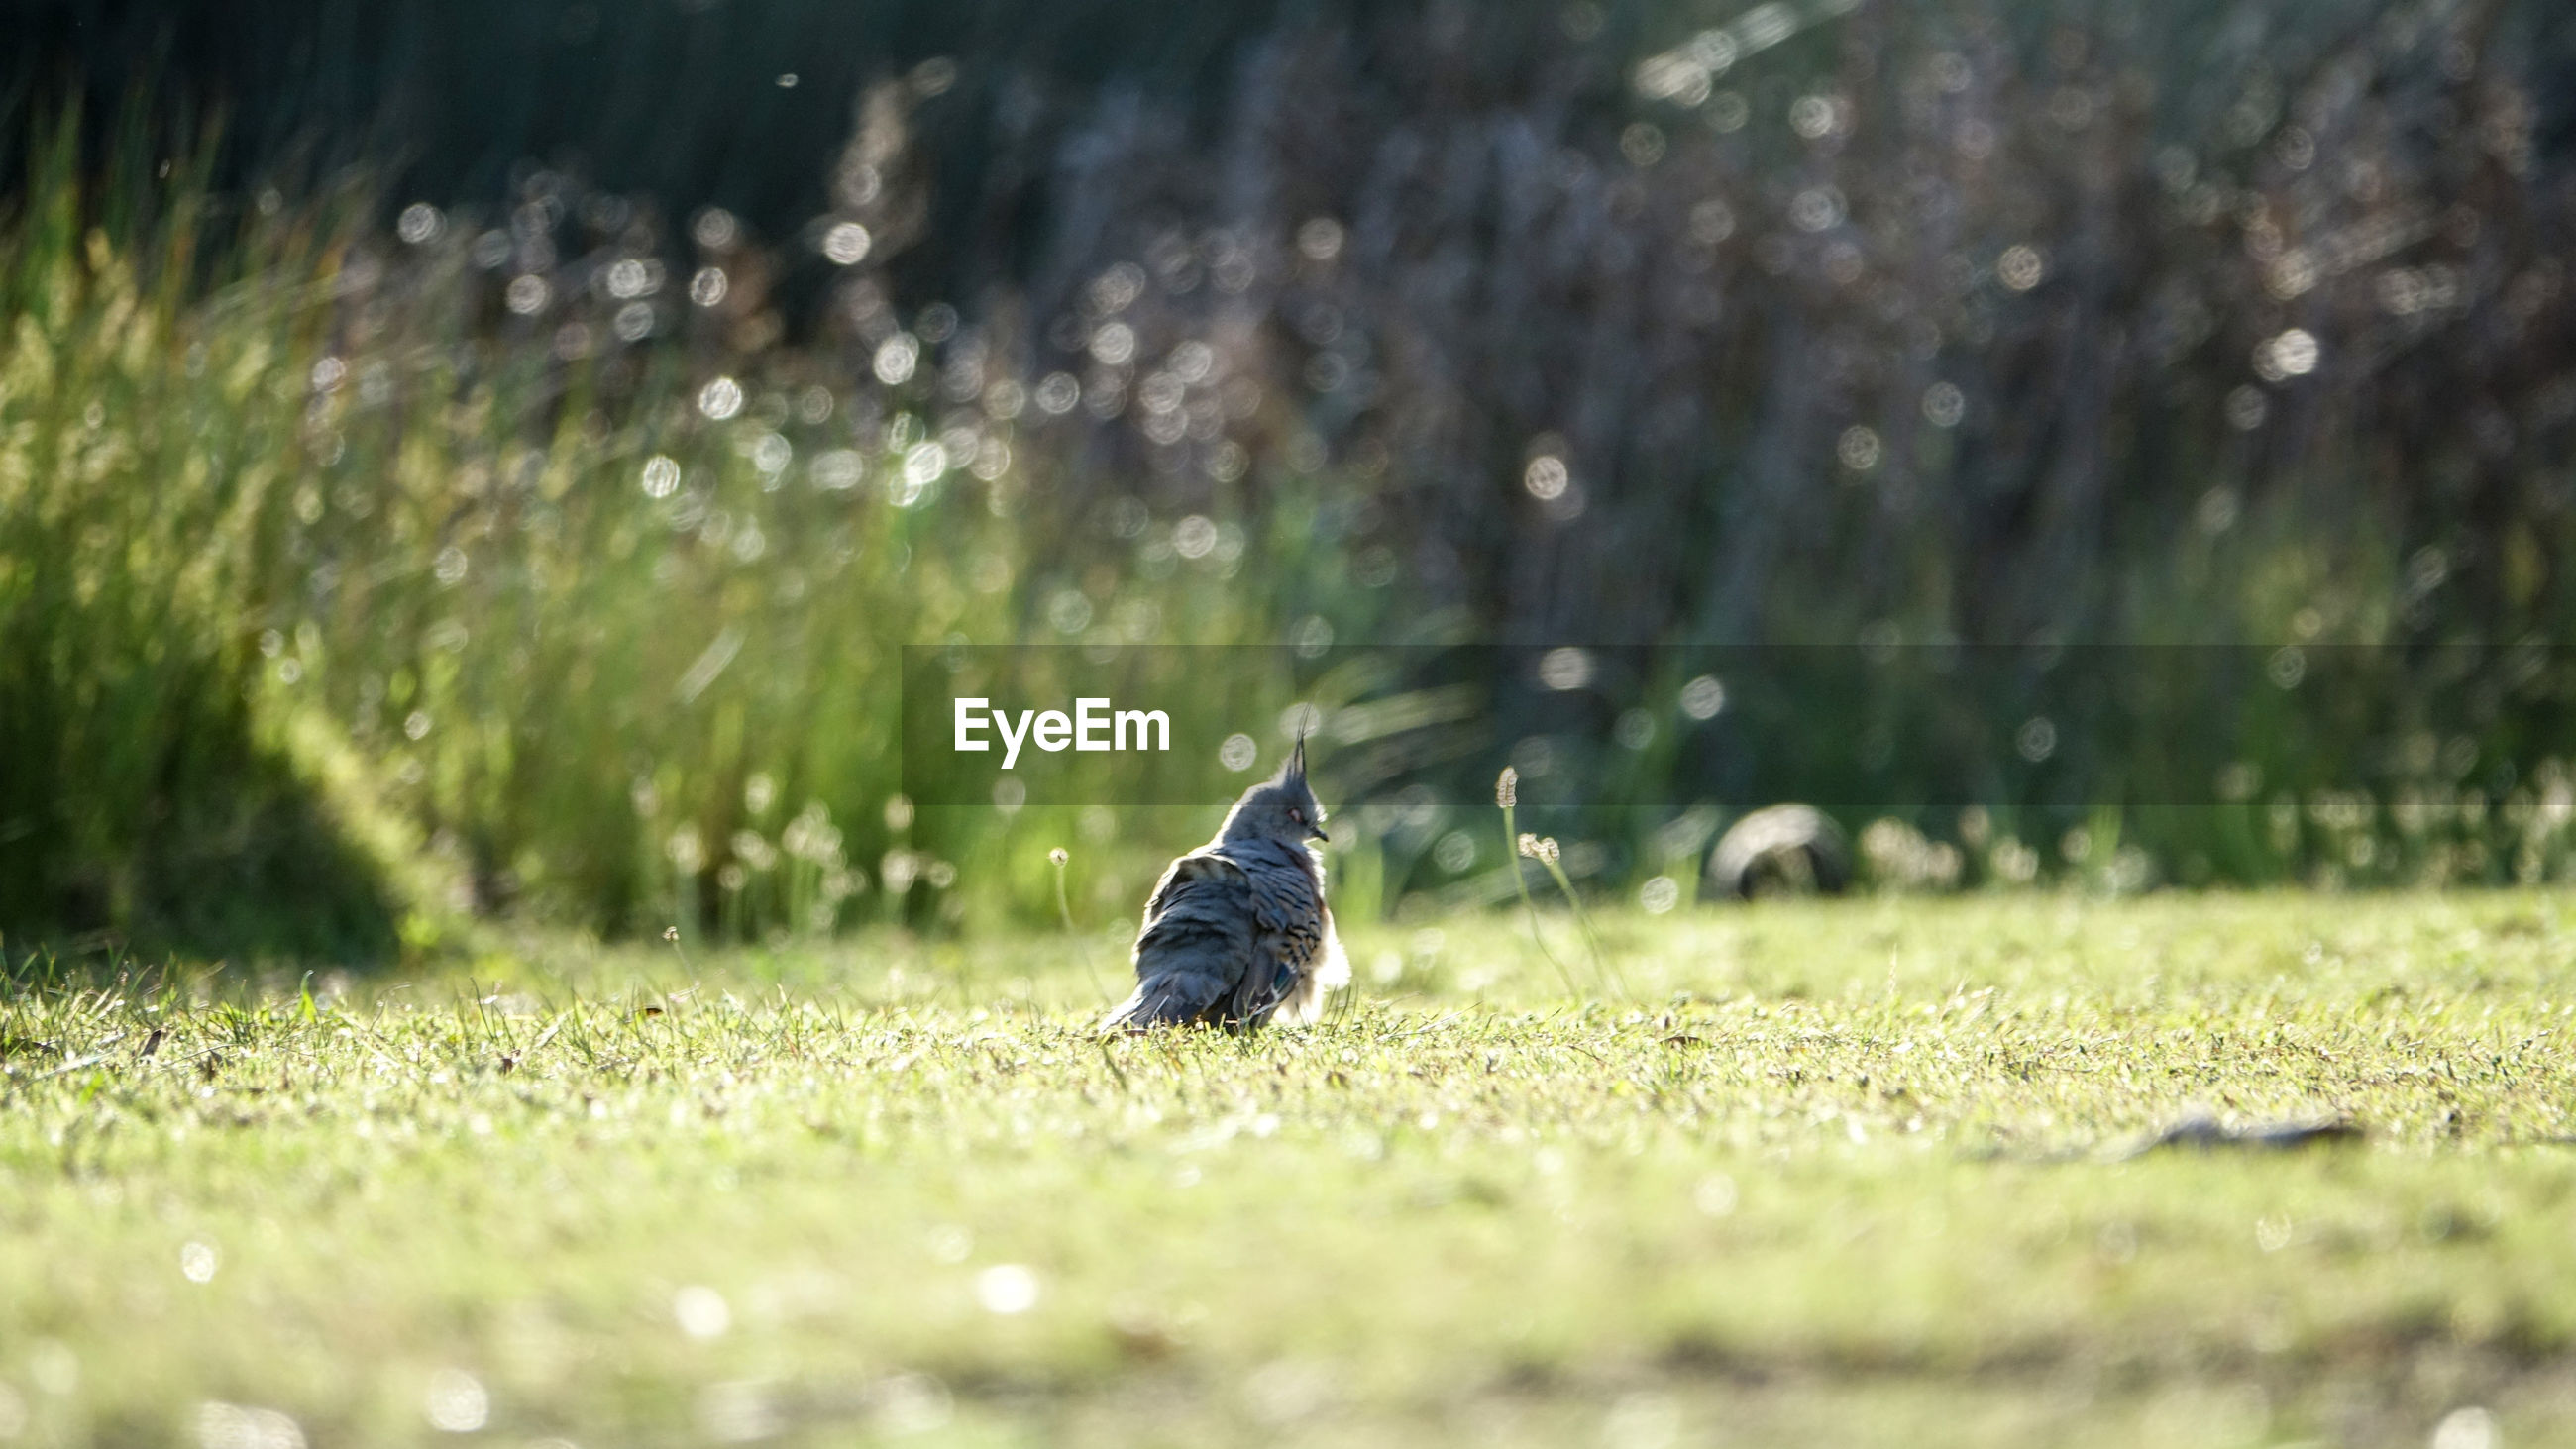 Close-up of bird perching on grassy field